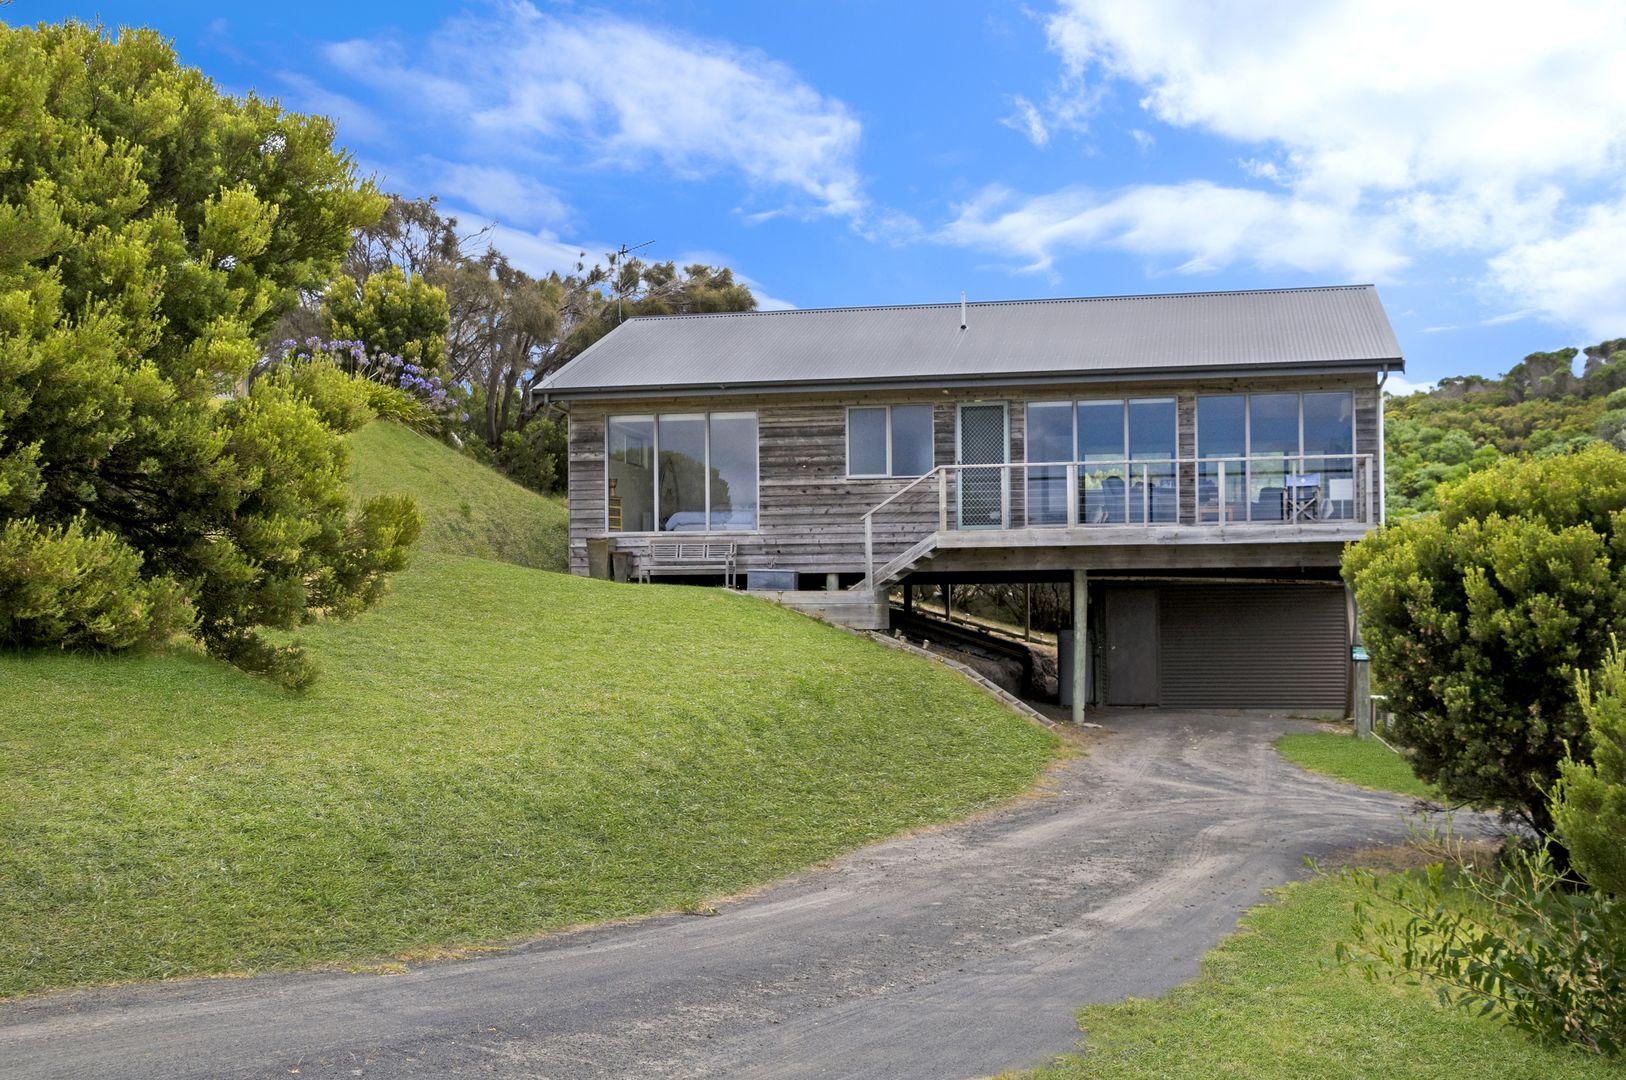 20  Panoramic Drive, Cape Bridgewater VIC 3305, Image 0